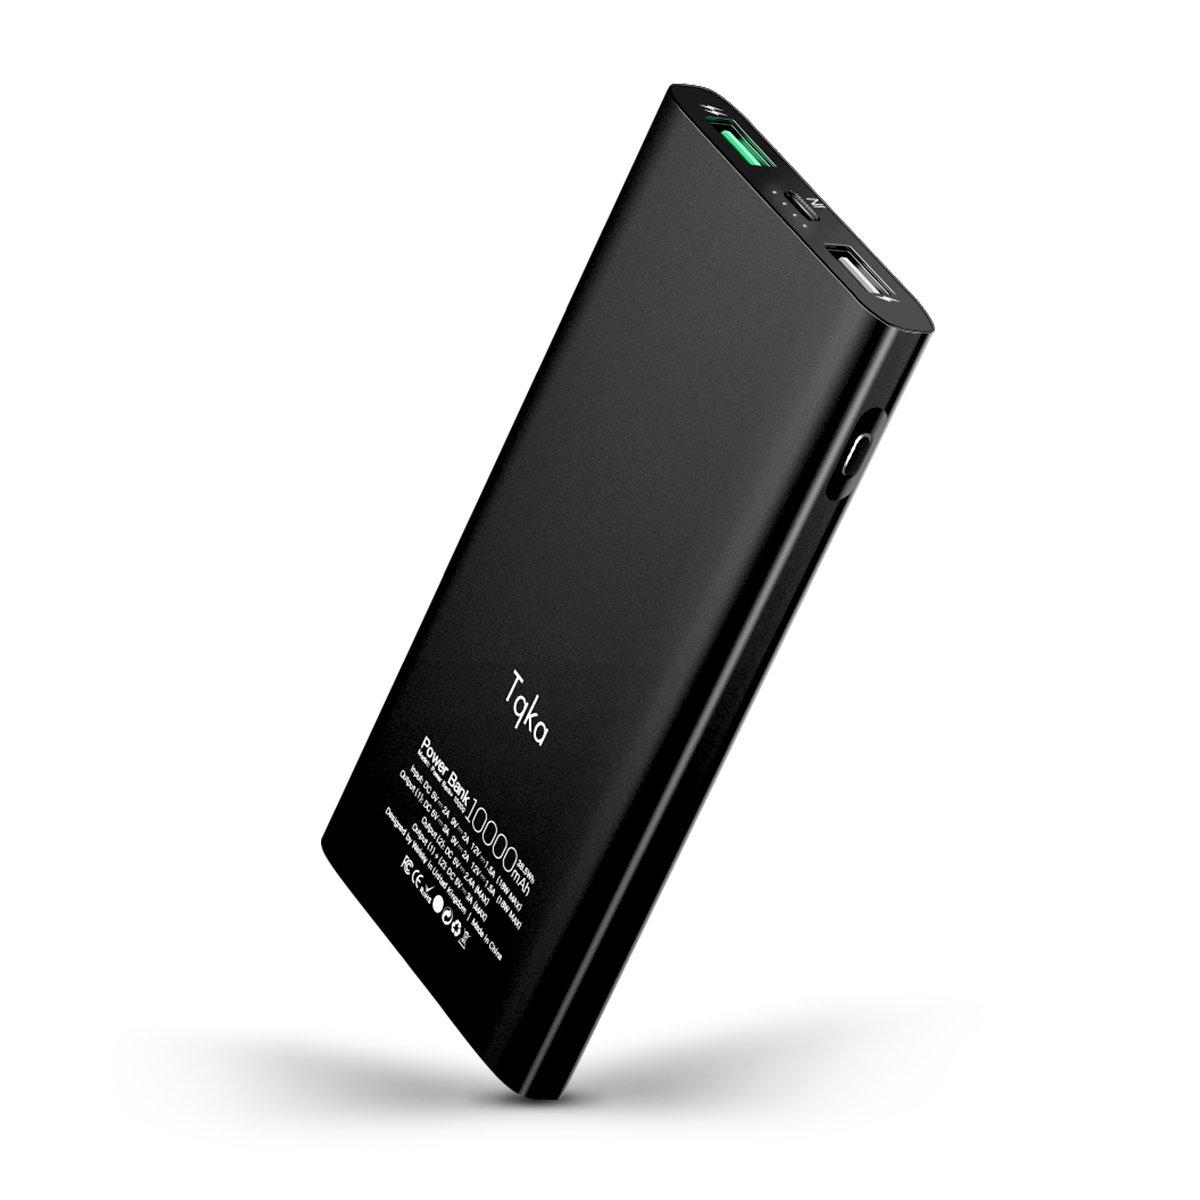 10000mAh Portable Charger Quick Charge 3.0 Input & Output Power Bank KA021